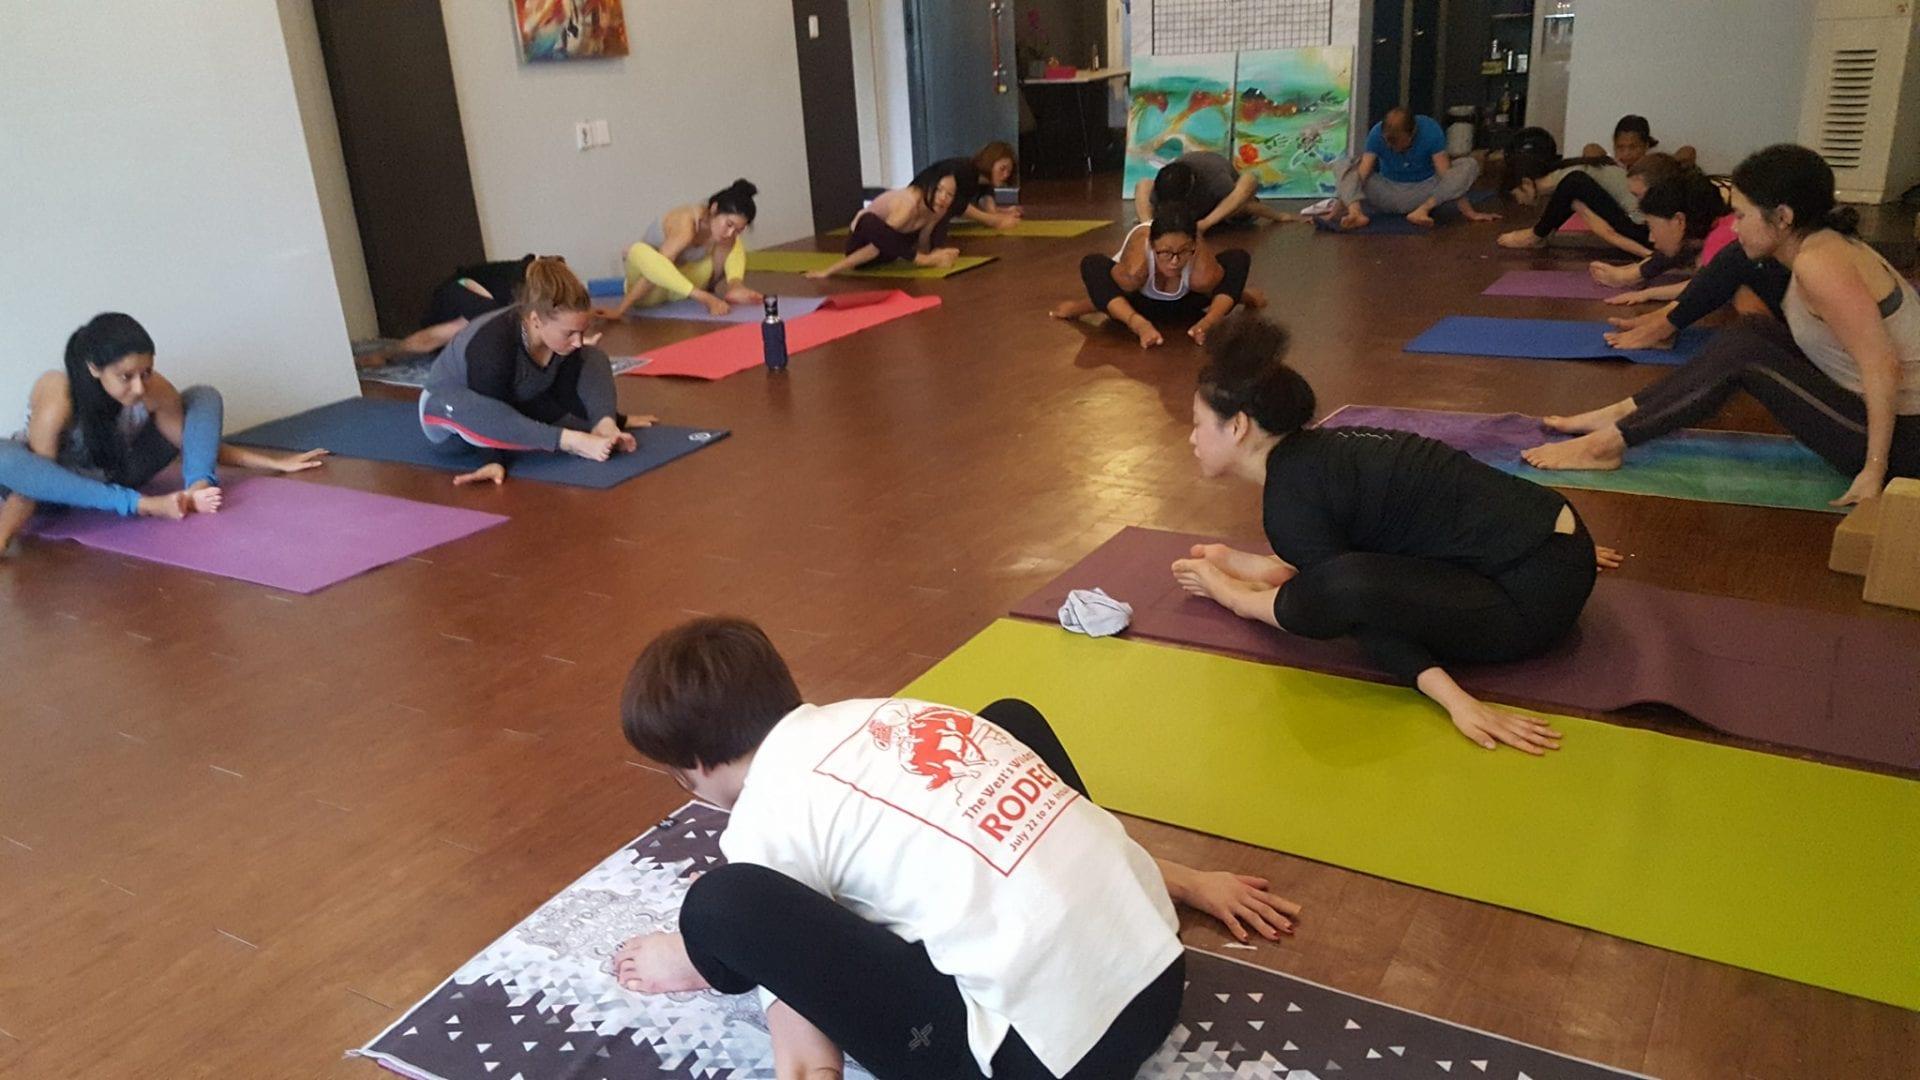 Kaizen Yoga | Nam-gu, Busan